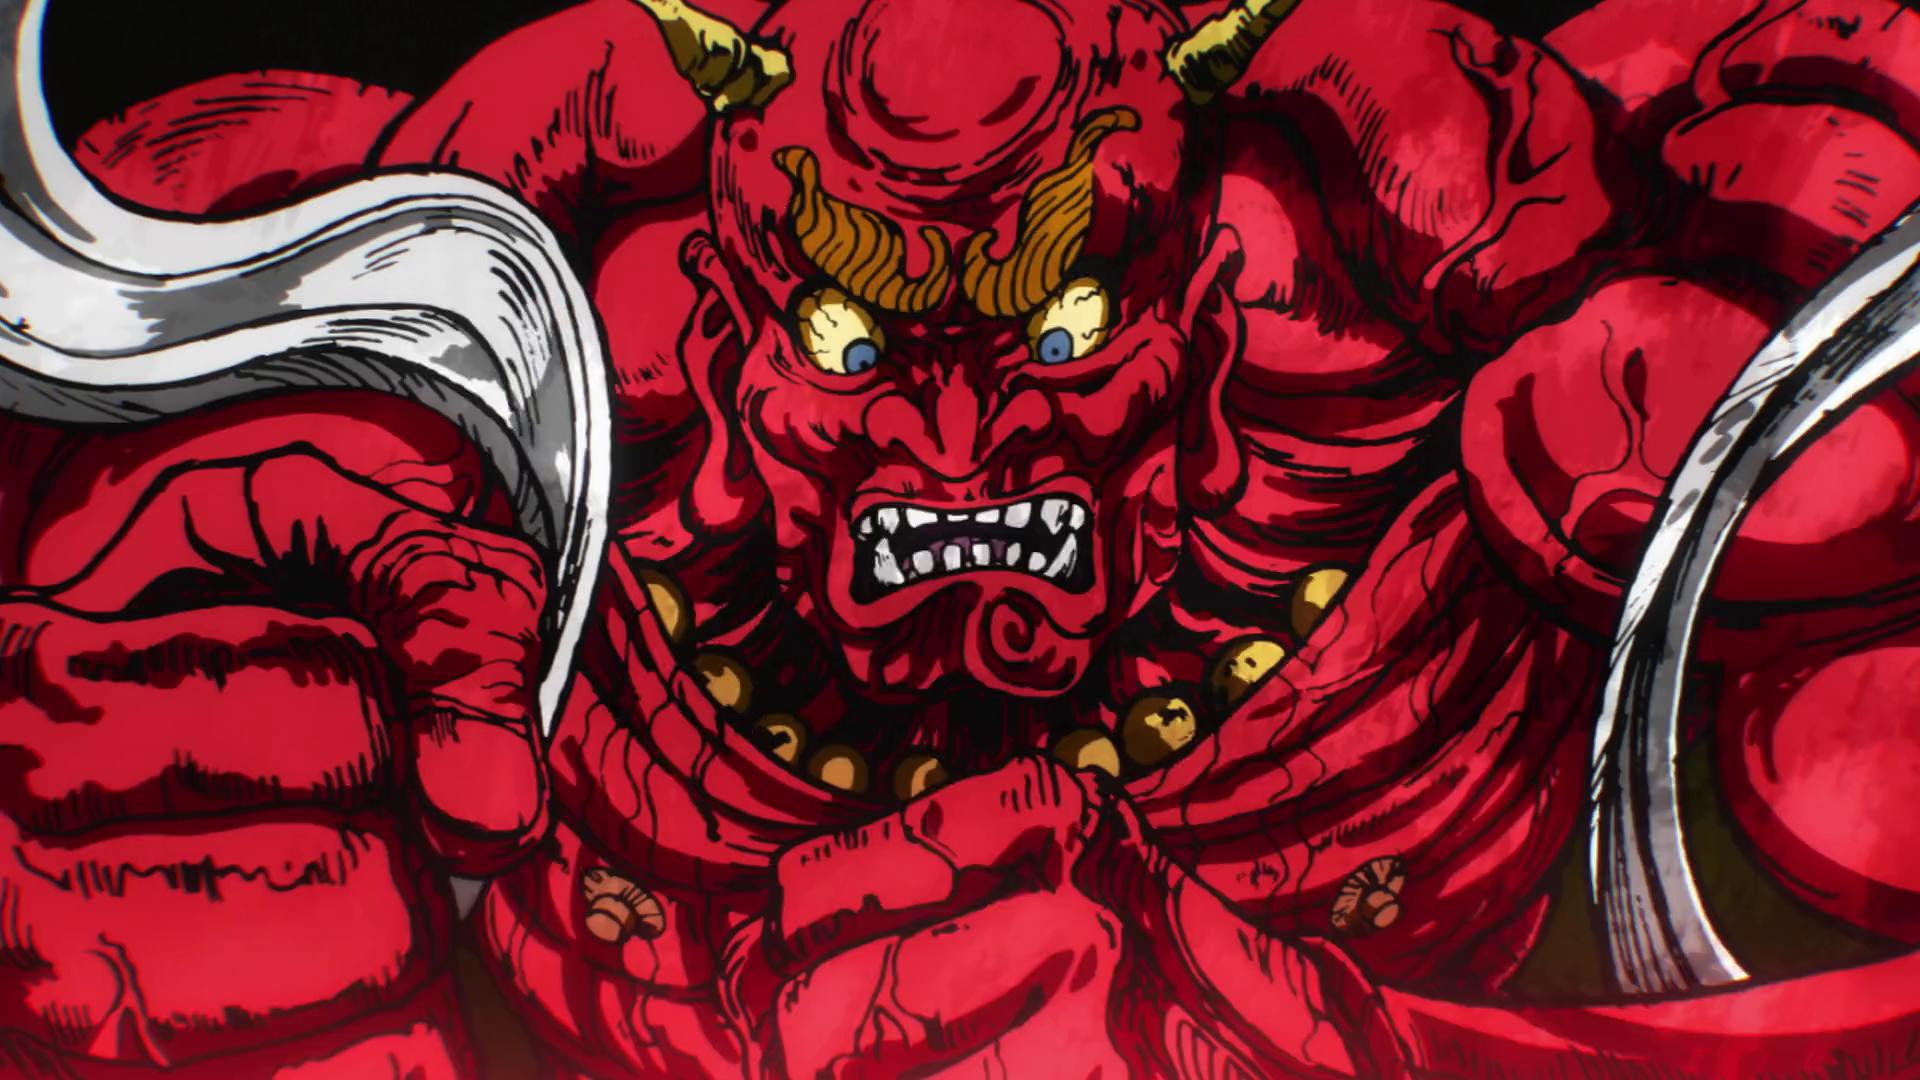 Oni demon wallpapers top free oni demon backgrounds - Demon wallpaper 4k ...